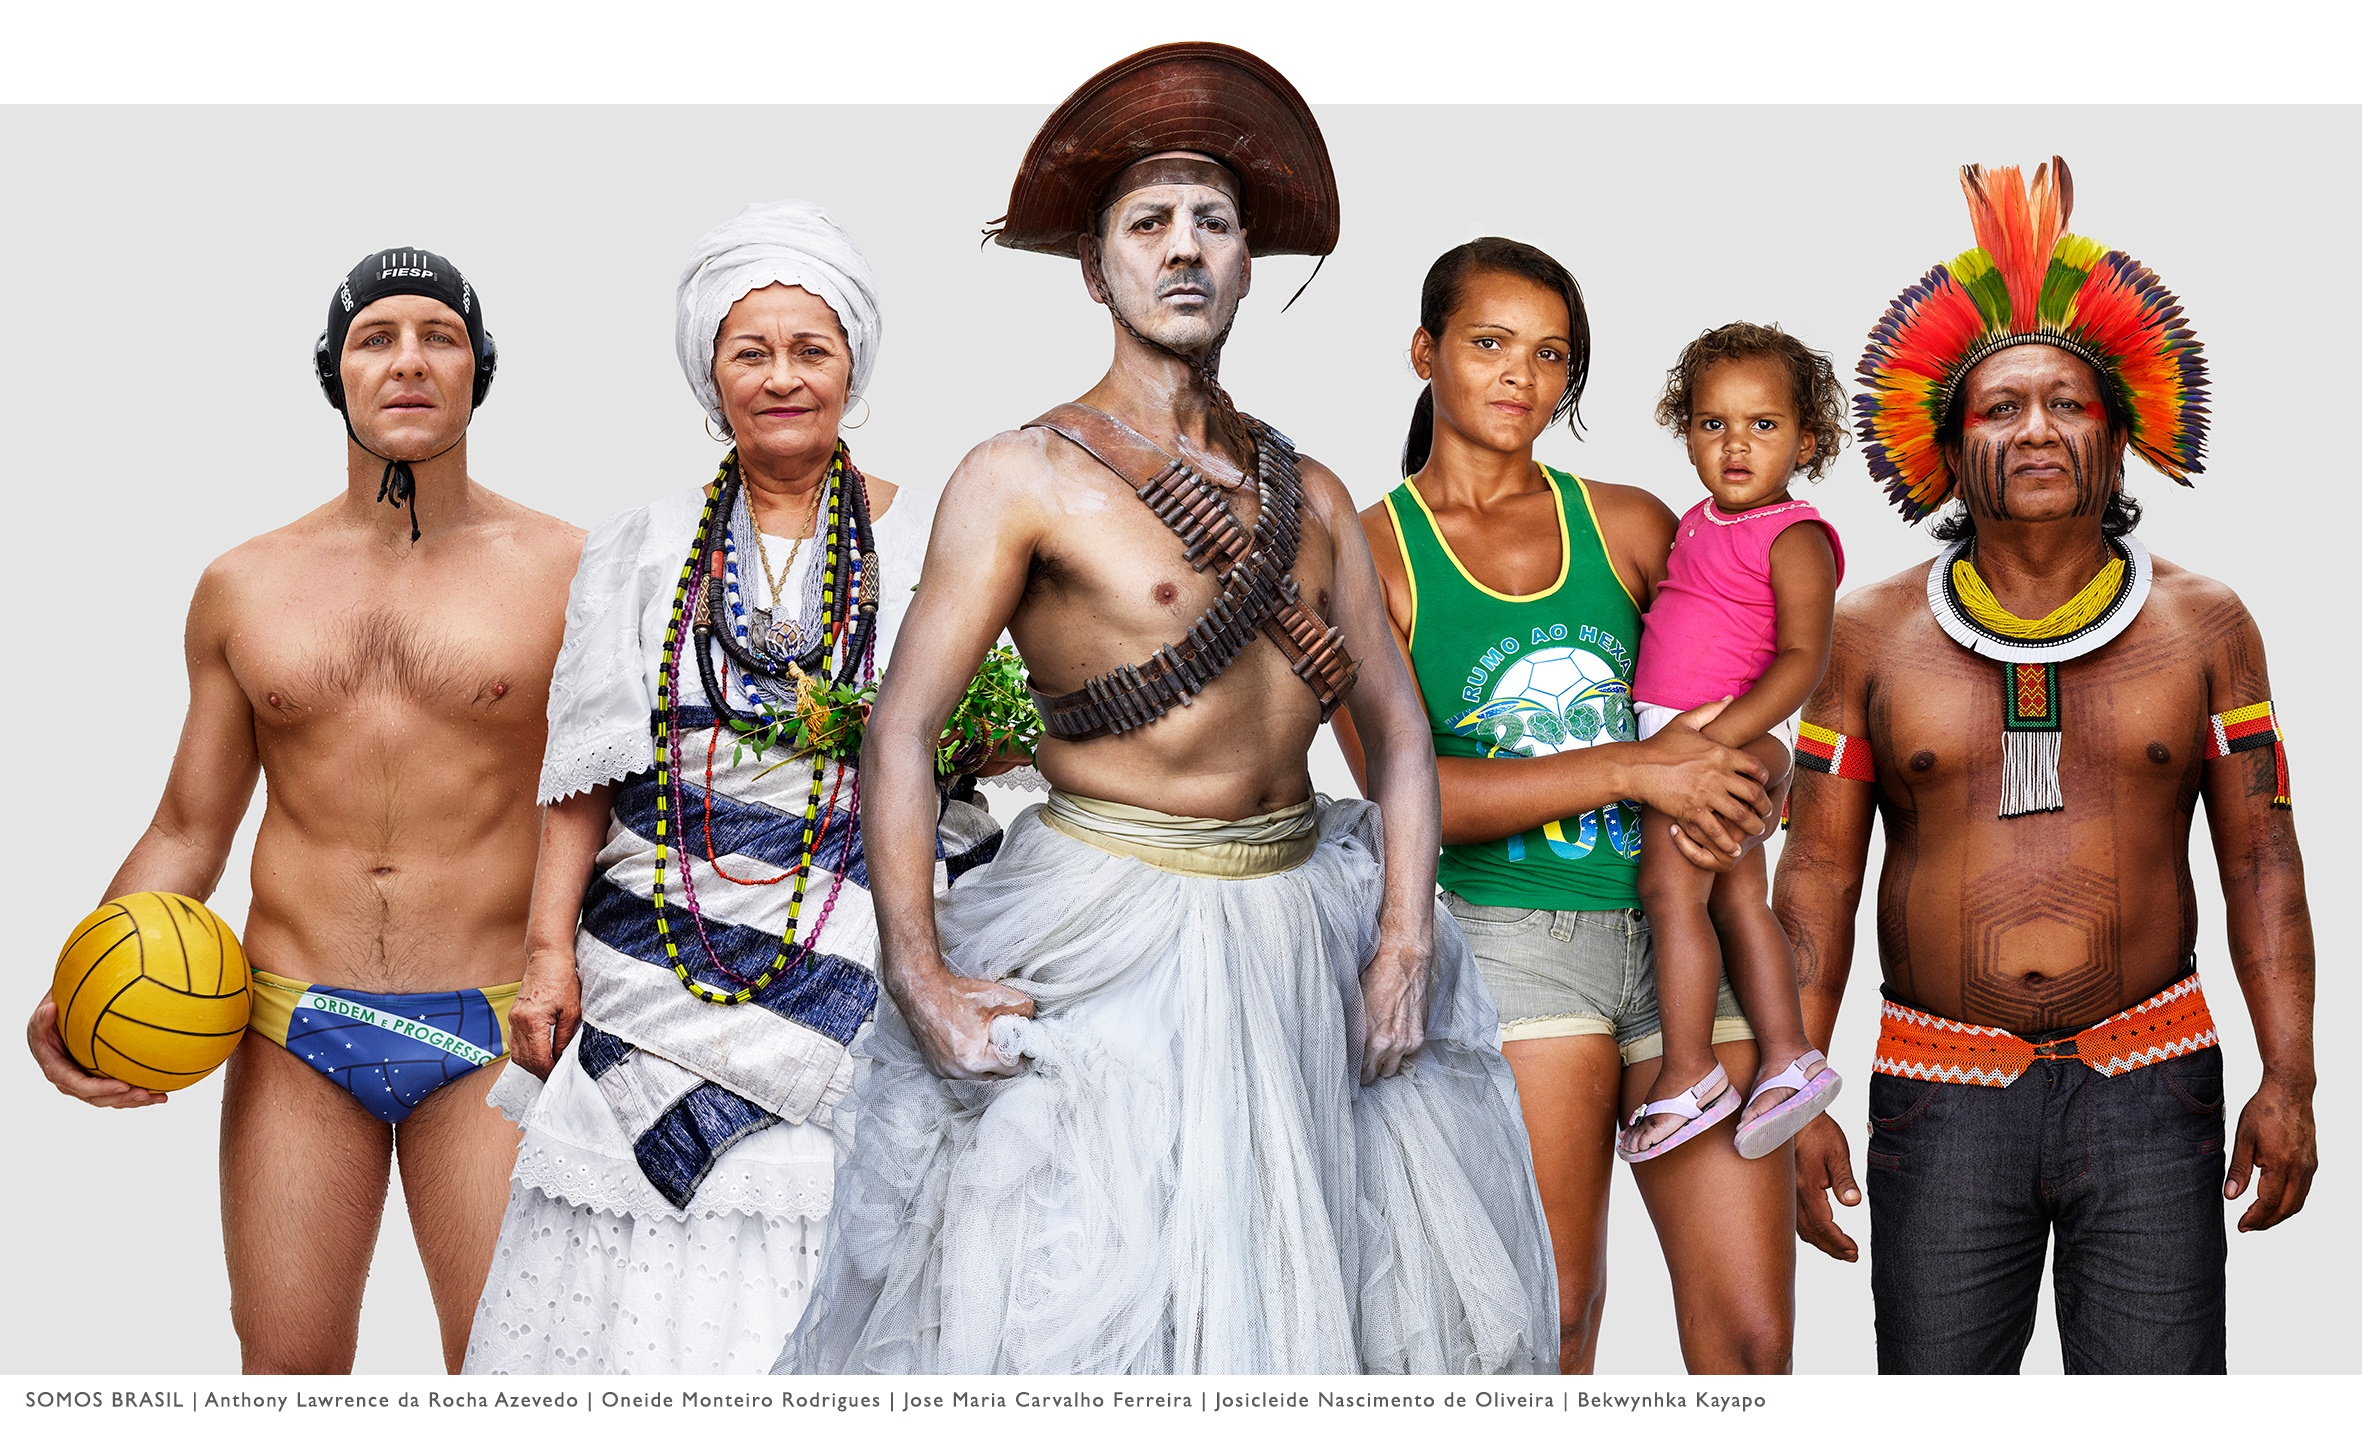 marcus-lyon-somos brazil